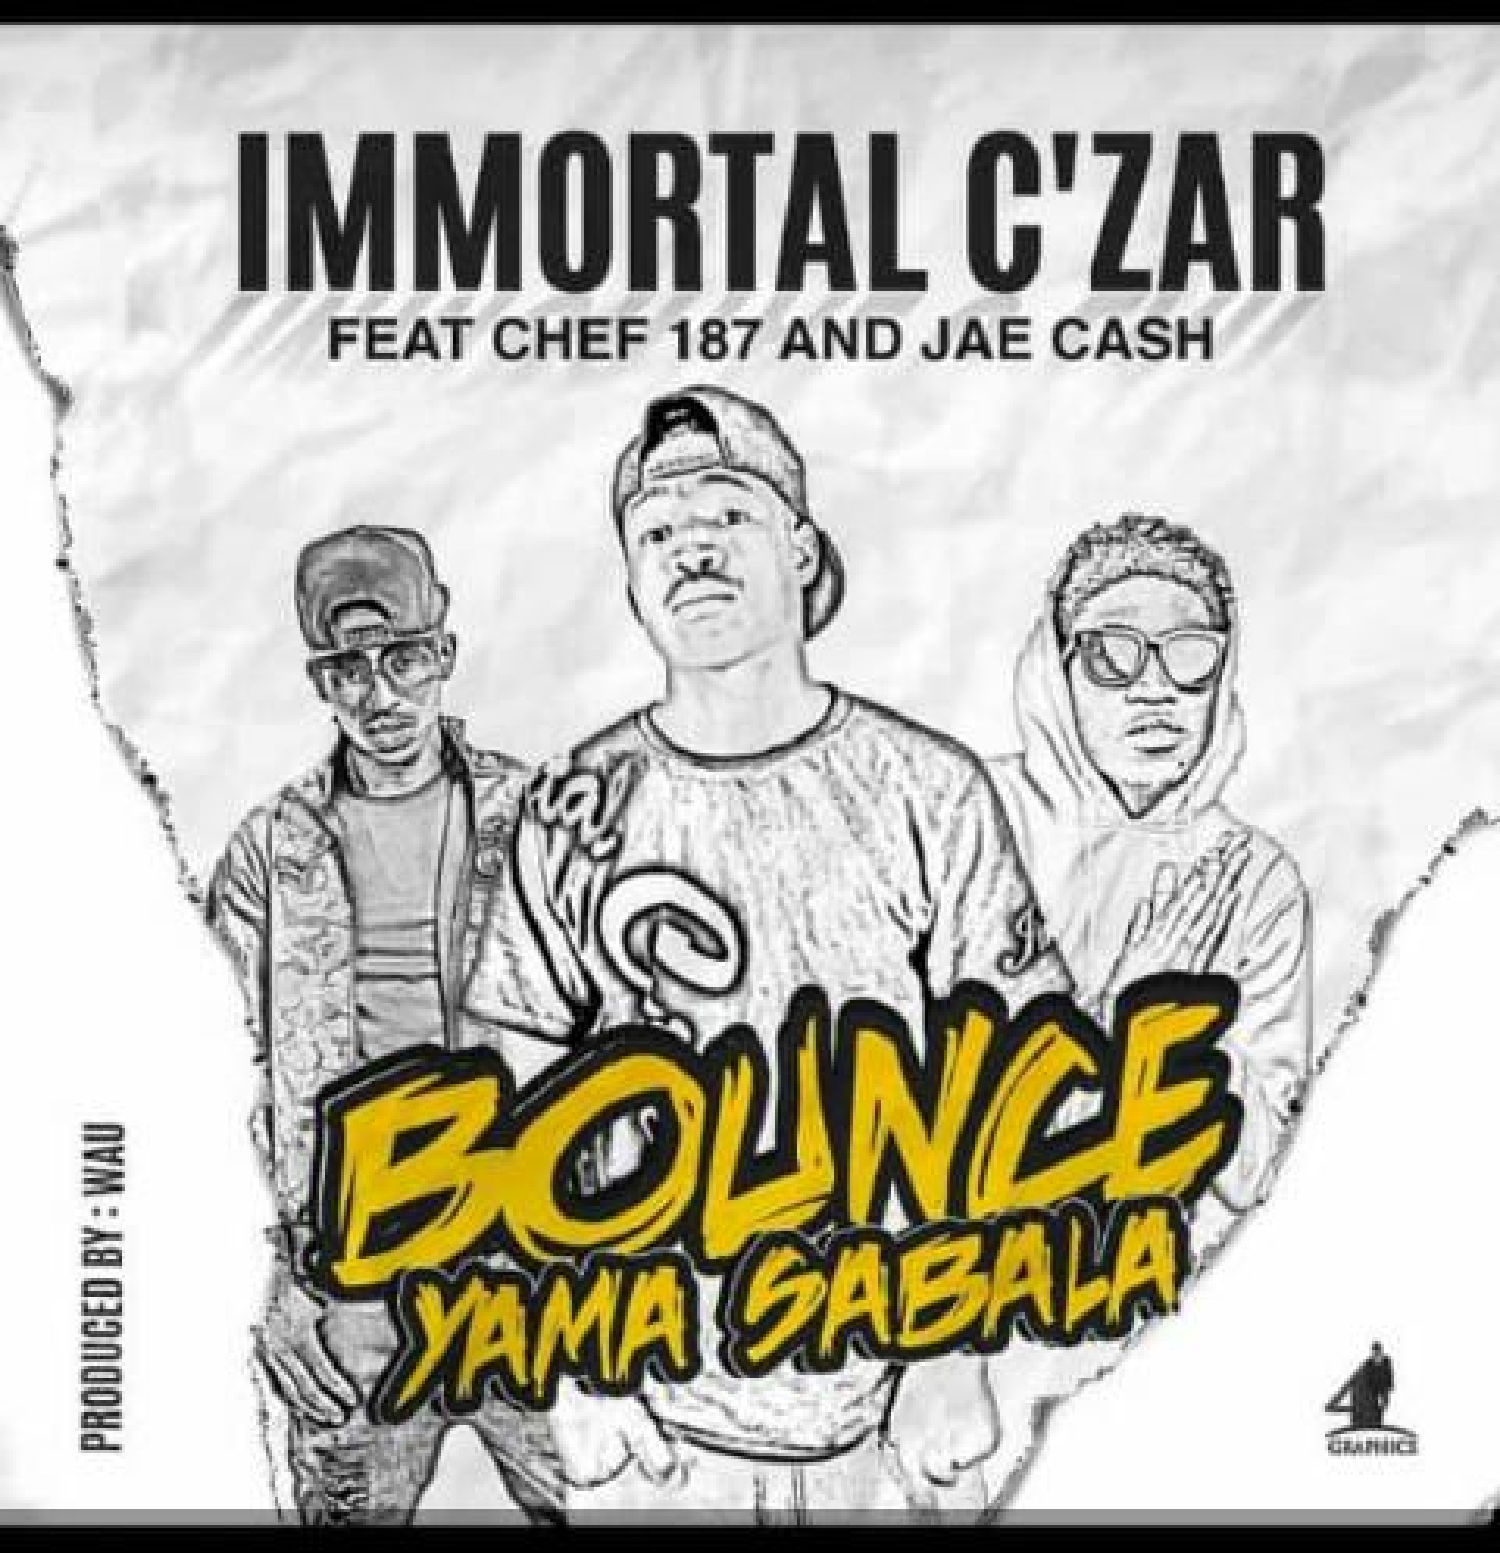 Immortal Czar Ft. Chef 187 Jae Cash Bounce Yama Sabala